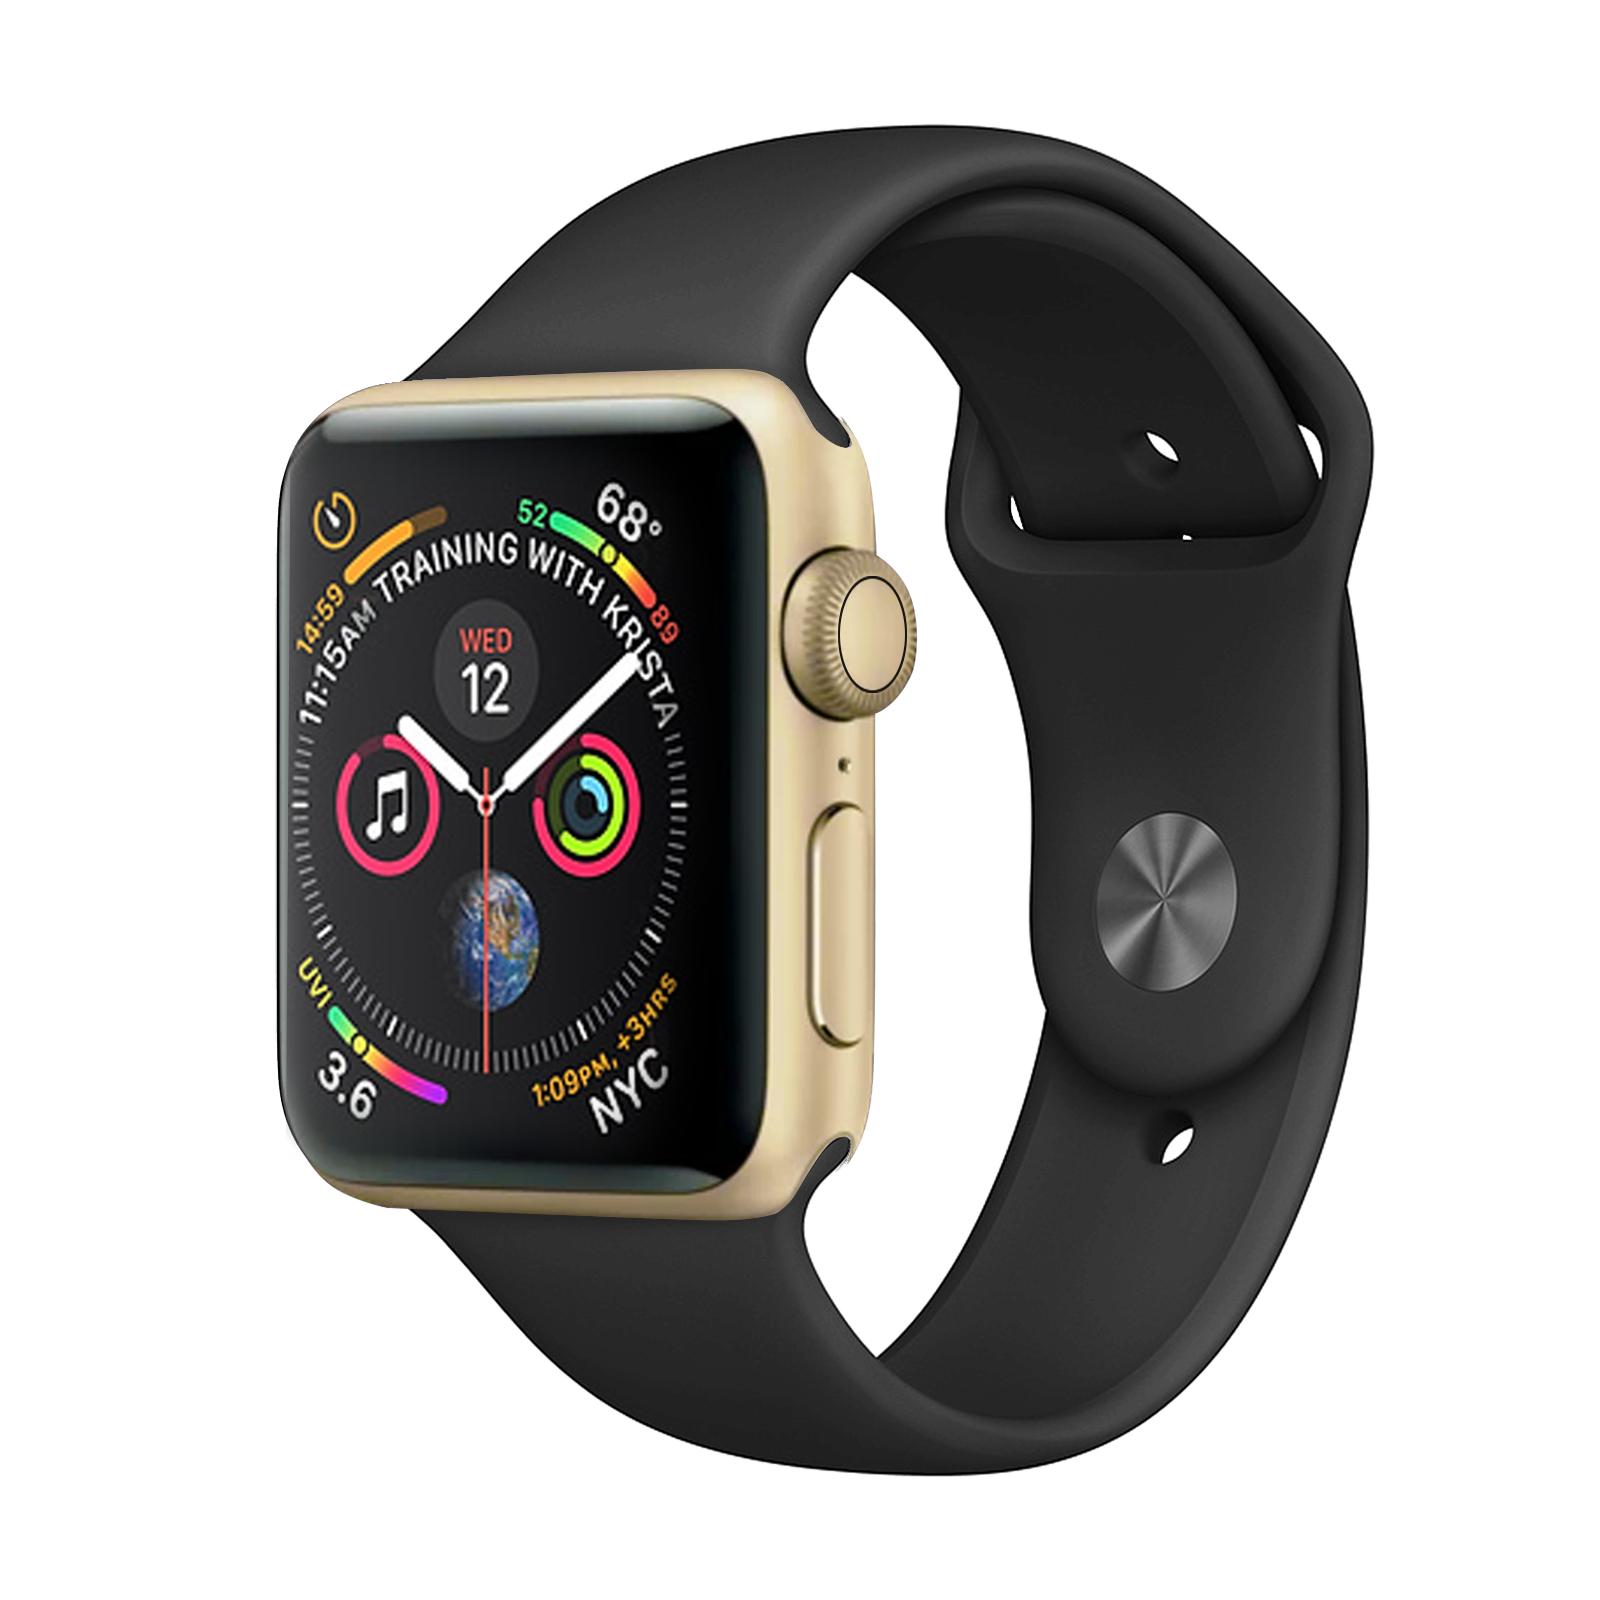 Apple Watch Series 4 Aluminium 40mm Used Grace C - Good £144 with code - loop_mobile / ebay